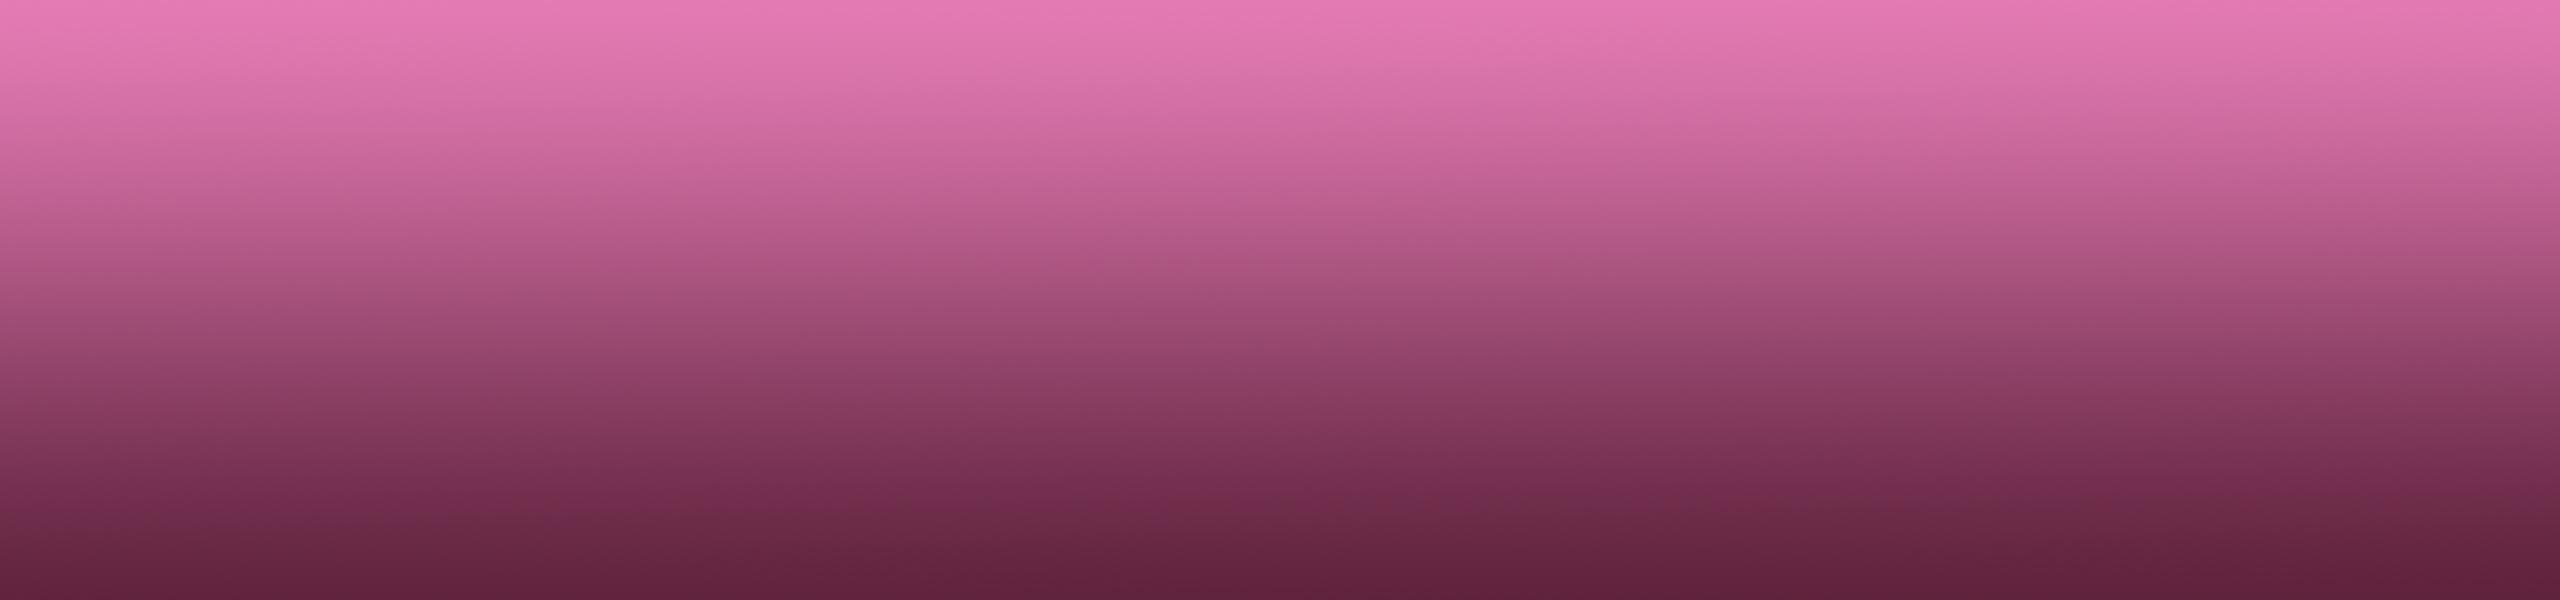 fondo-rosa